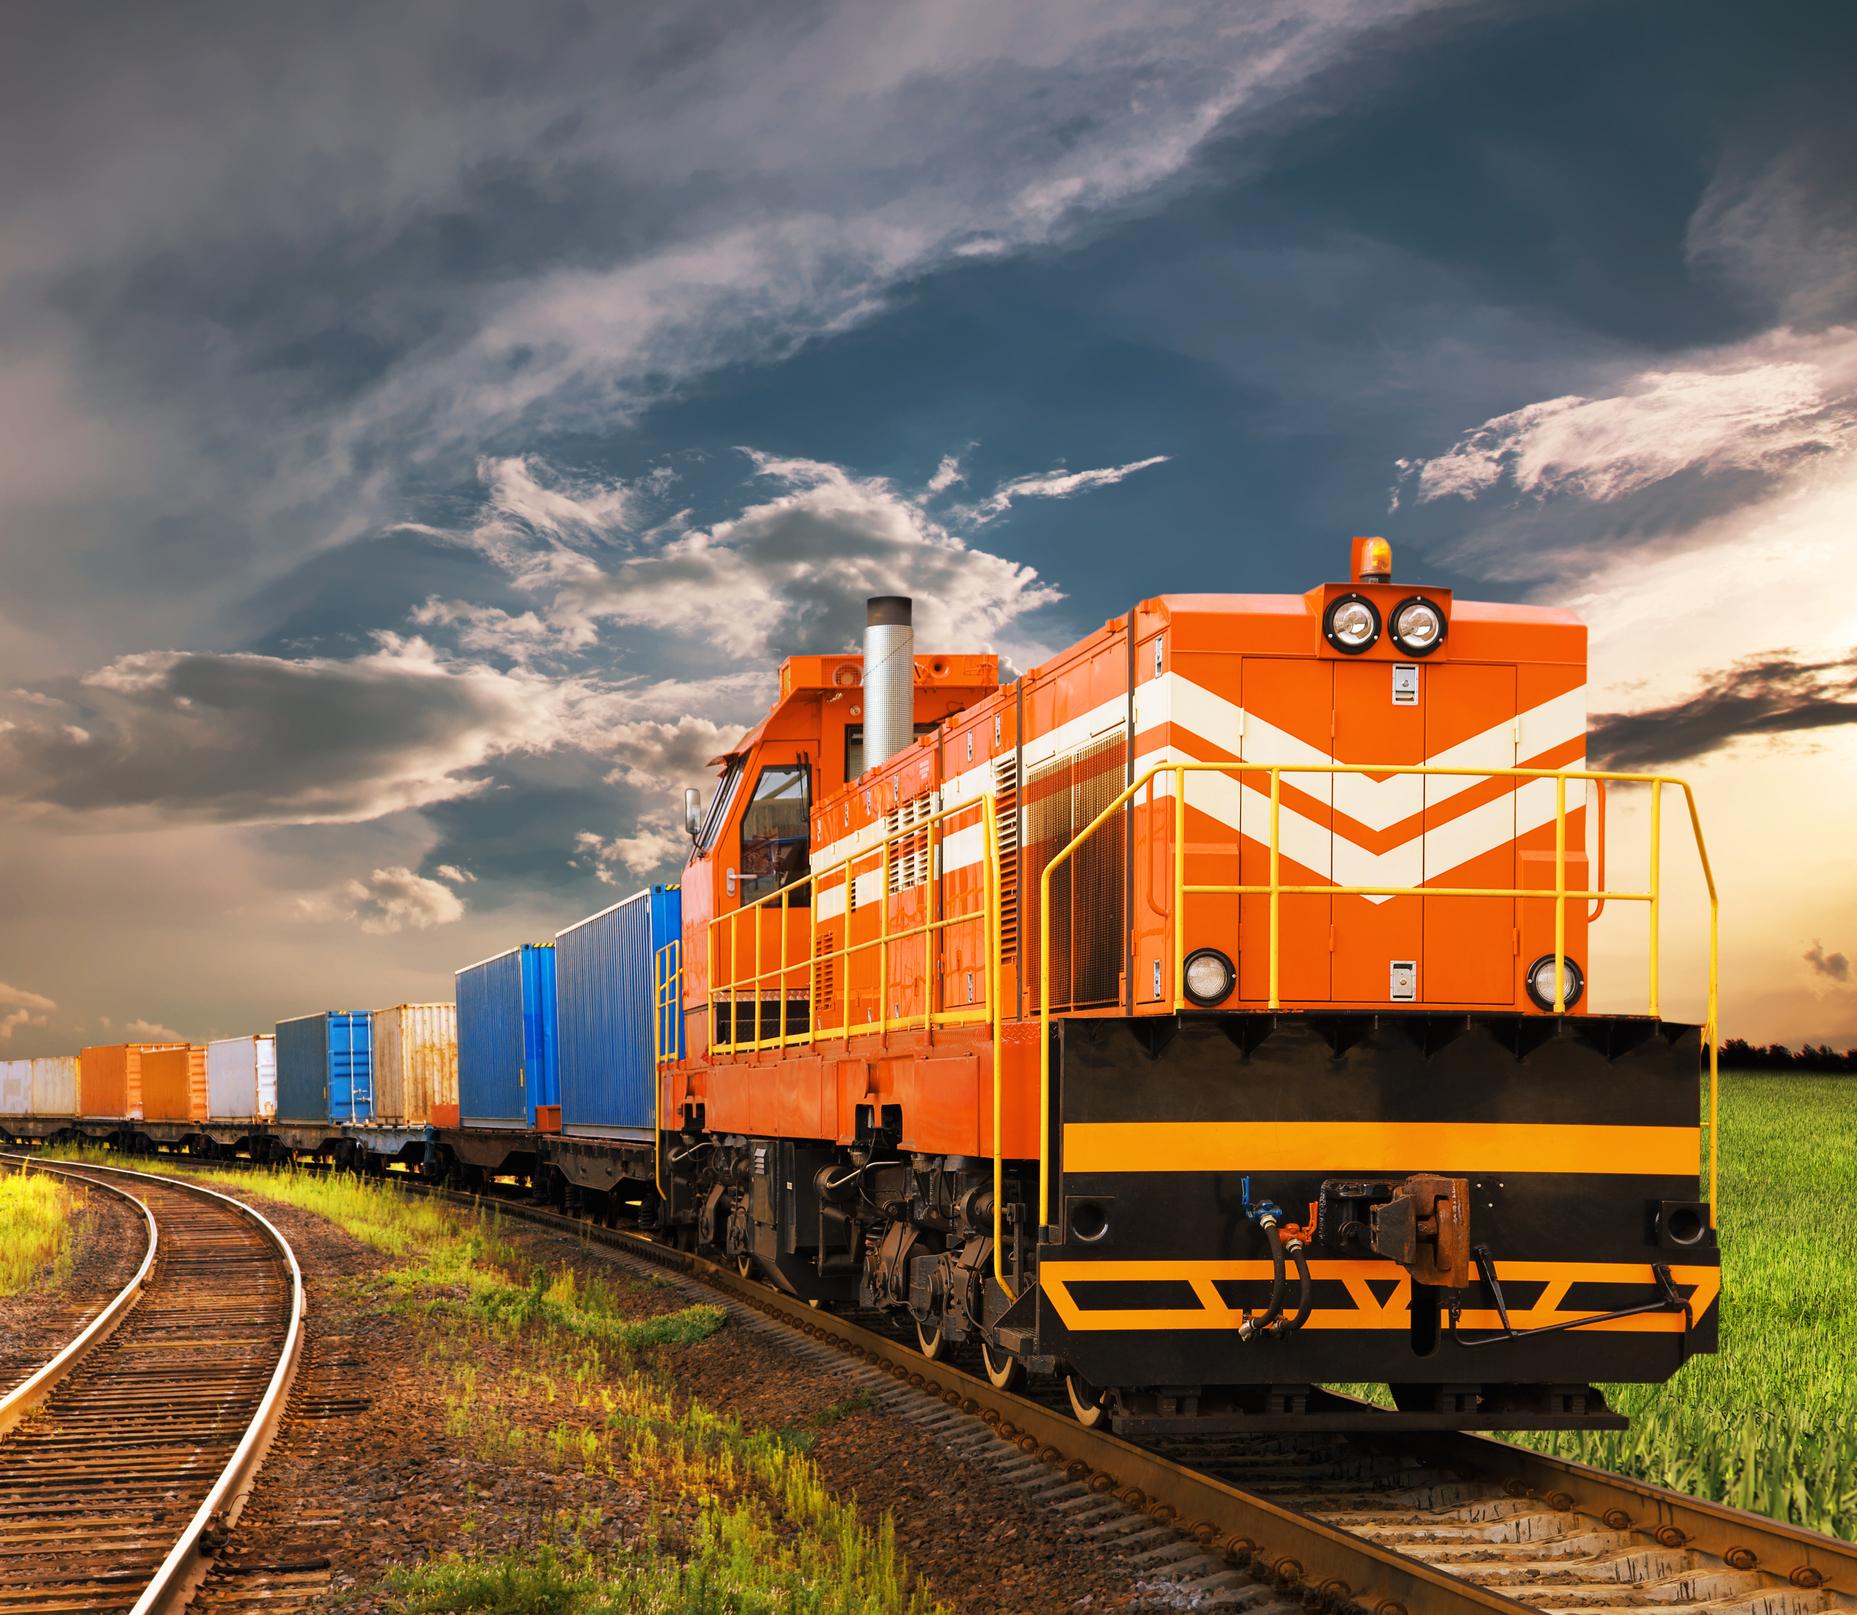 A freight train approaching